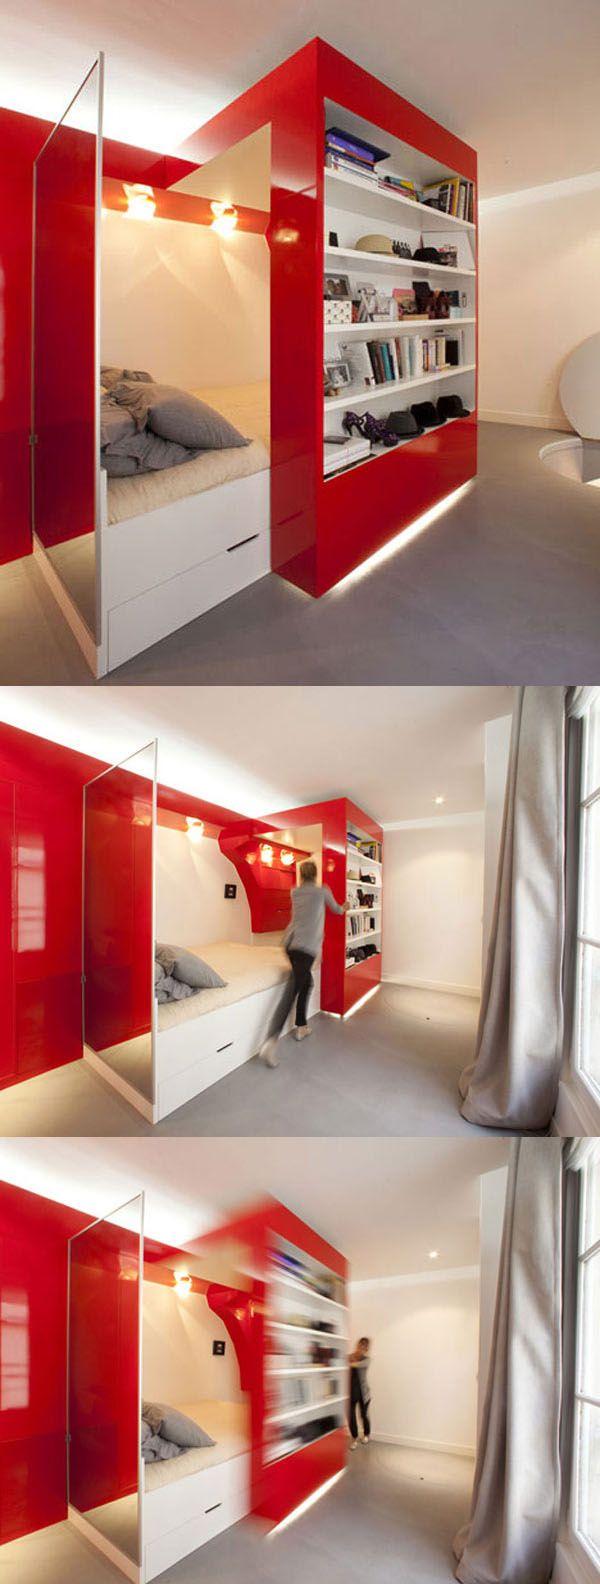 A hidden bed 38 Smart Small Bedroom